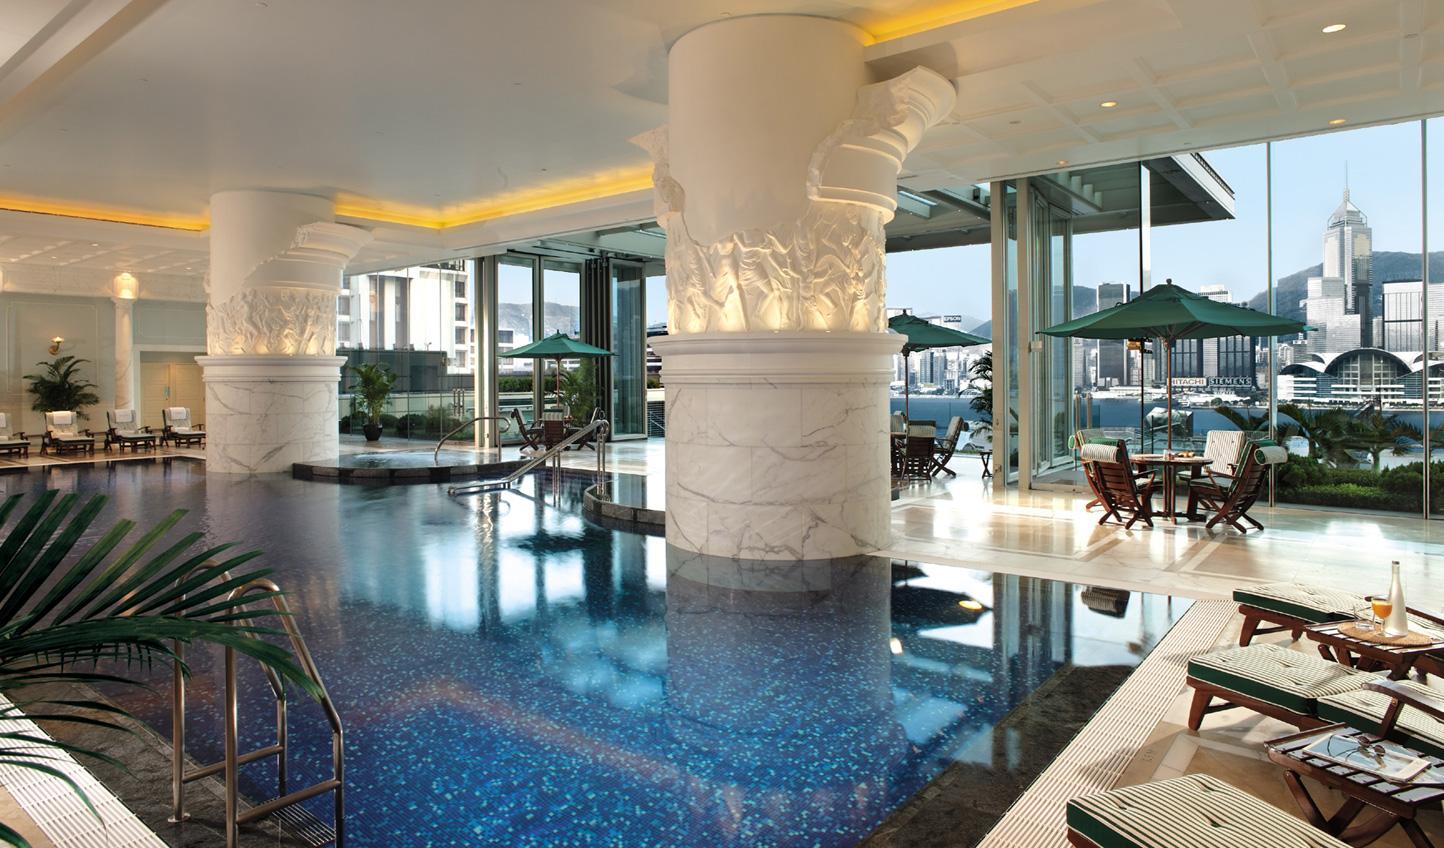 Romesque design creates a grand impression by the pool